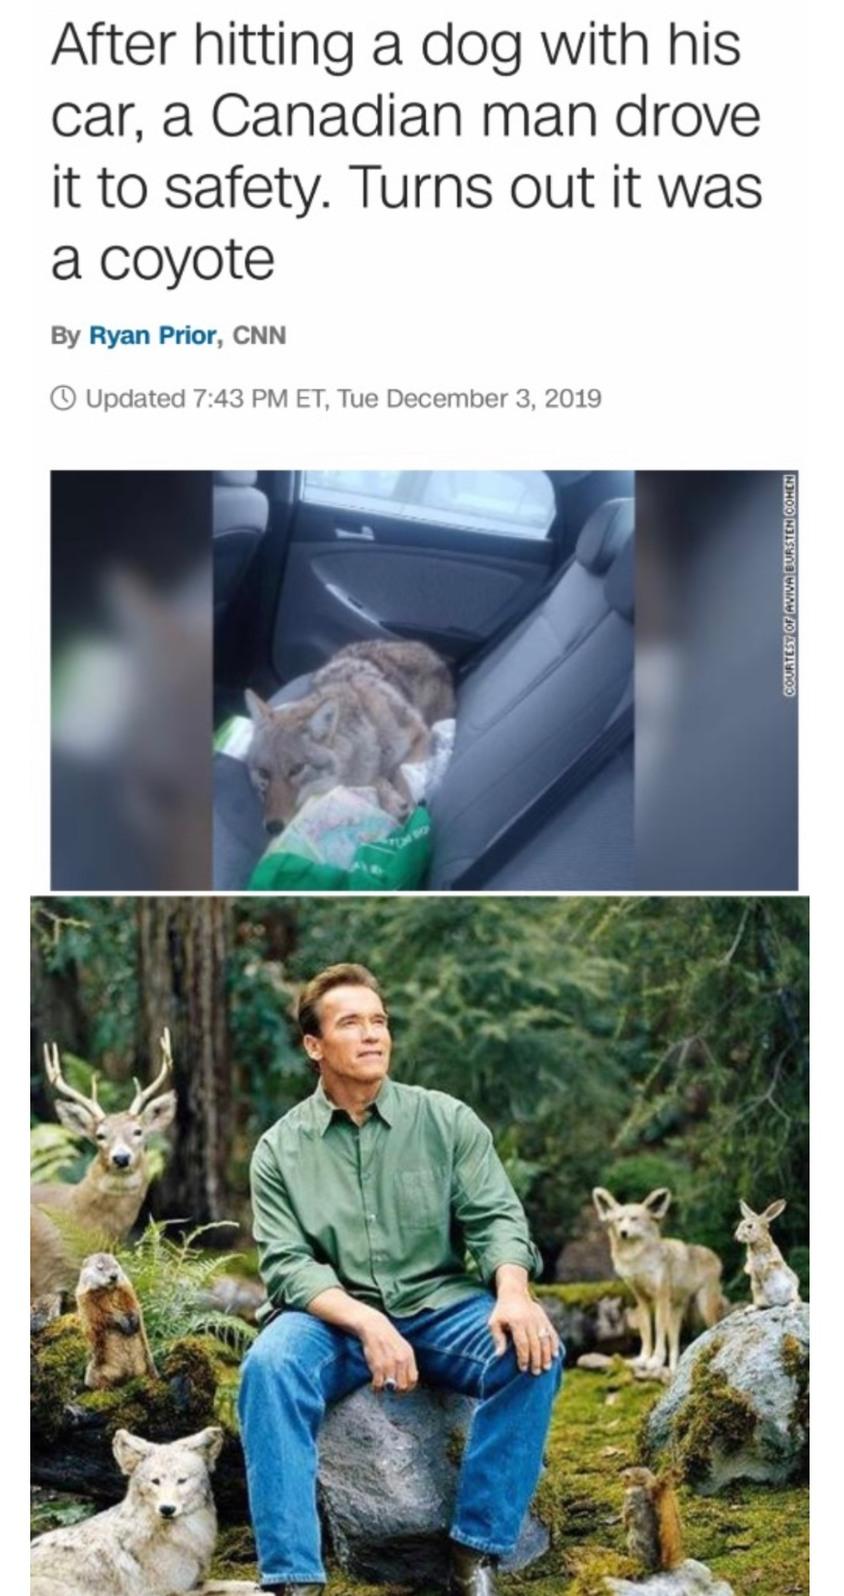 wild doggo is a good boi, making full recovery - meme